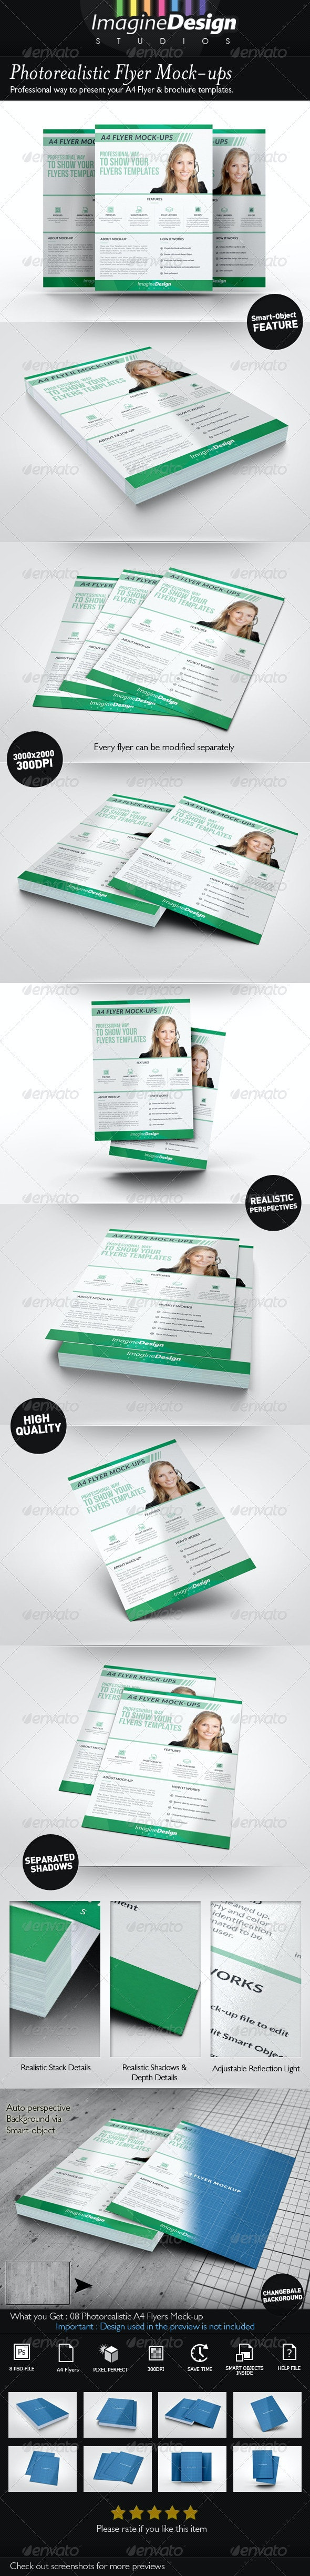 Photorealistic Flyer Mock-ups - Flyers Print